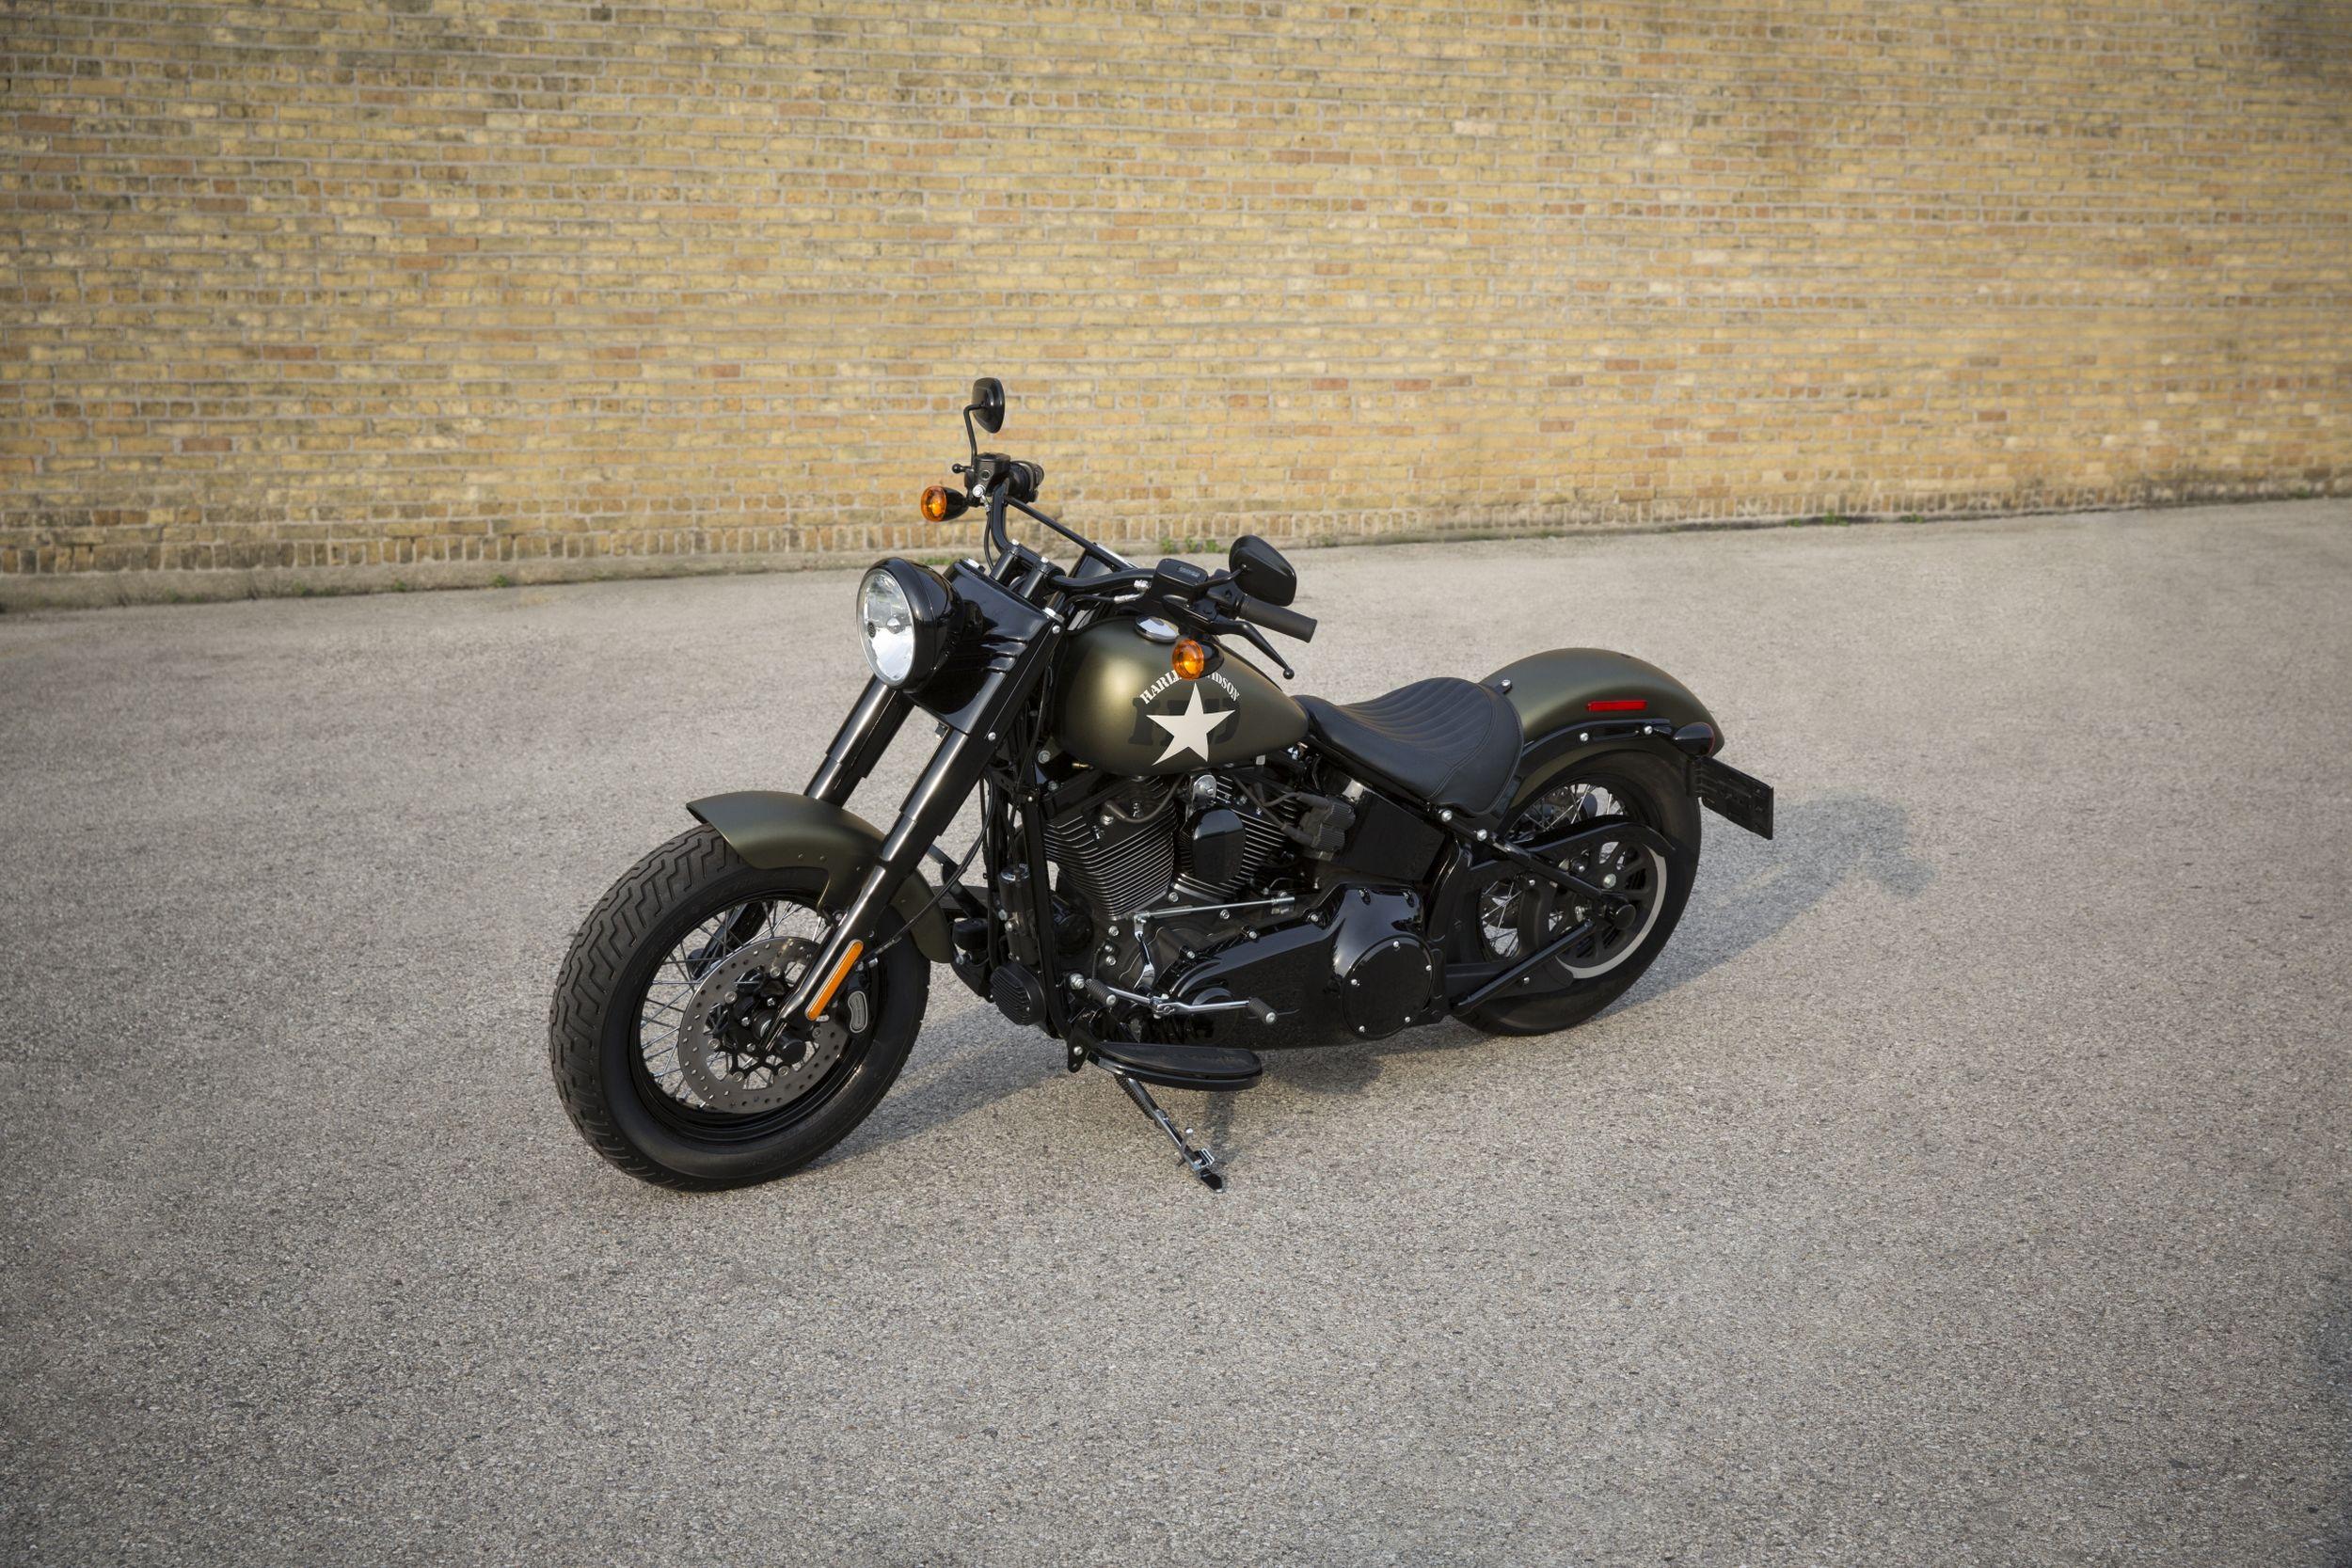 Sacoche Harley Davidson Street Bob Occasion